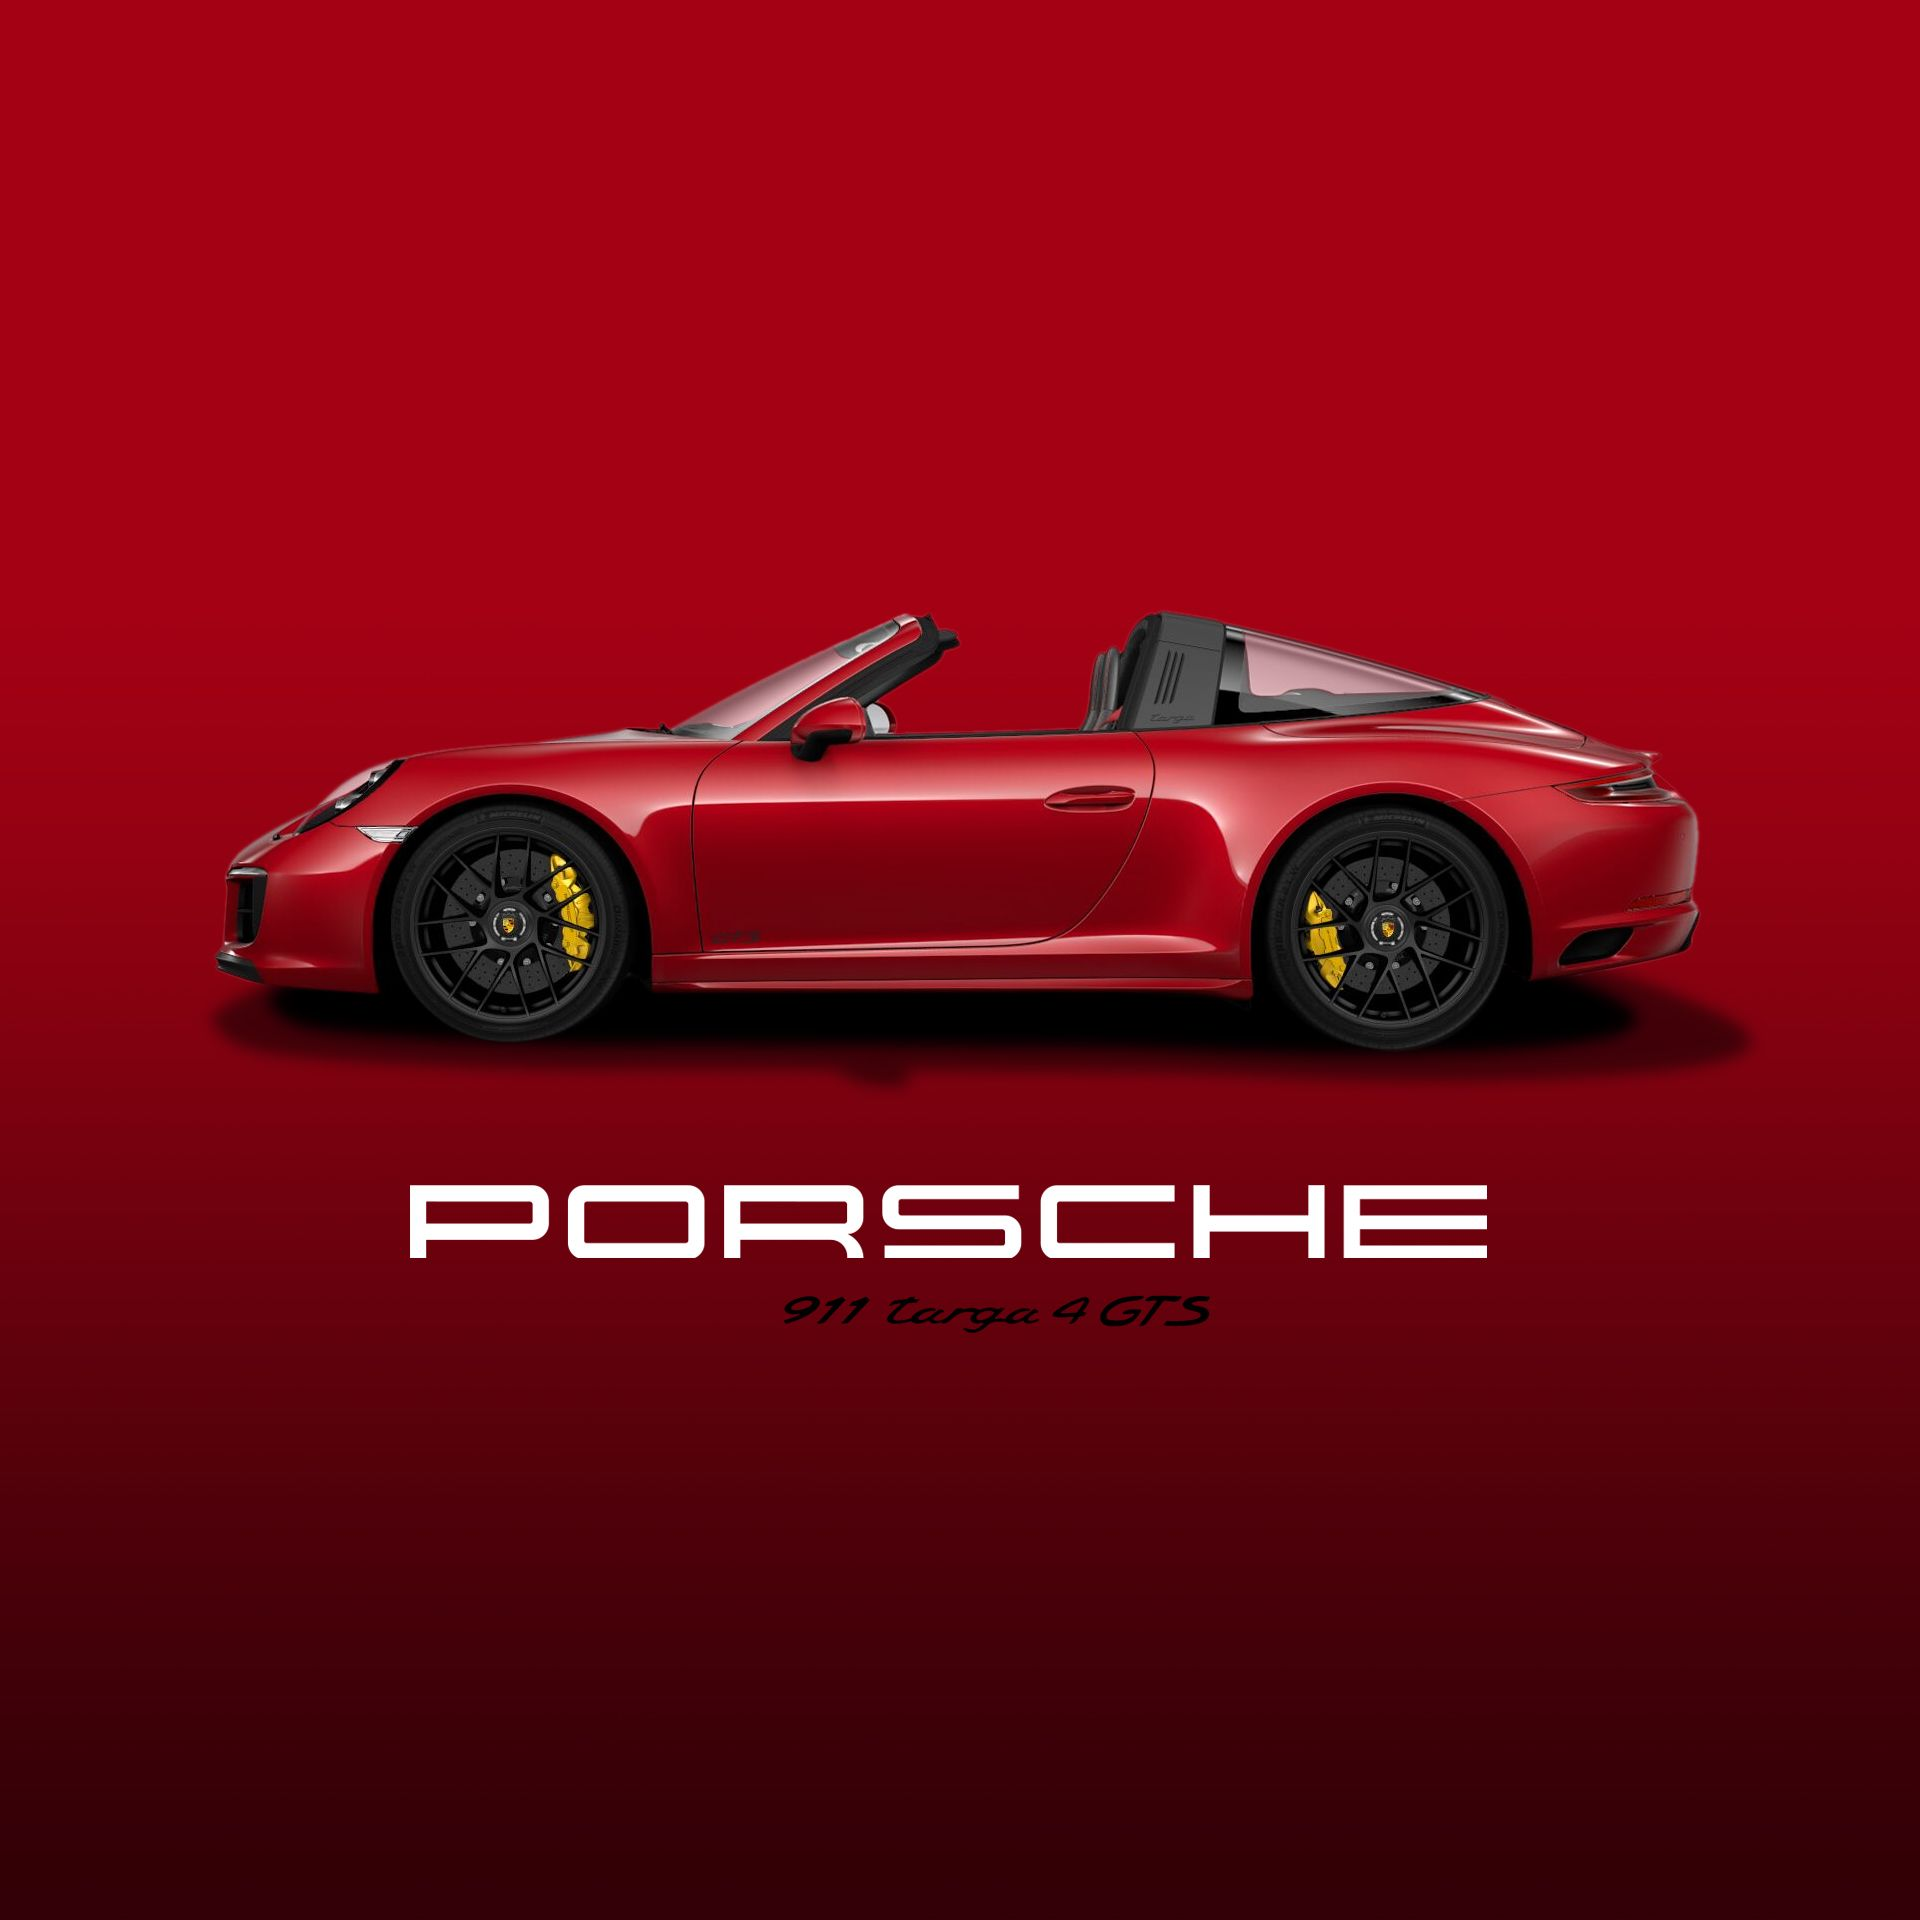 Porsche 911 Targa 4 Gts Carmine Red Turbo S Wheels Alcantara Package Gts Carmine Red Ceramic Composite Bra Car Wheels Rims Porsche 911 Targa Car Wheels Diy